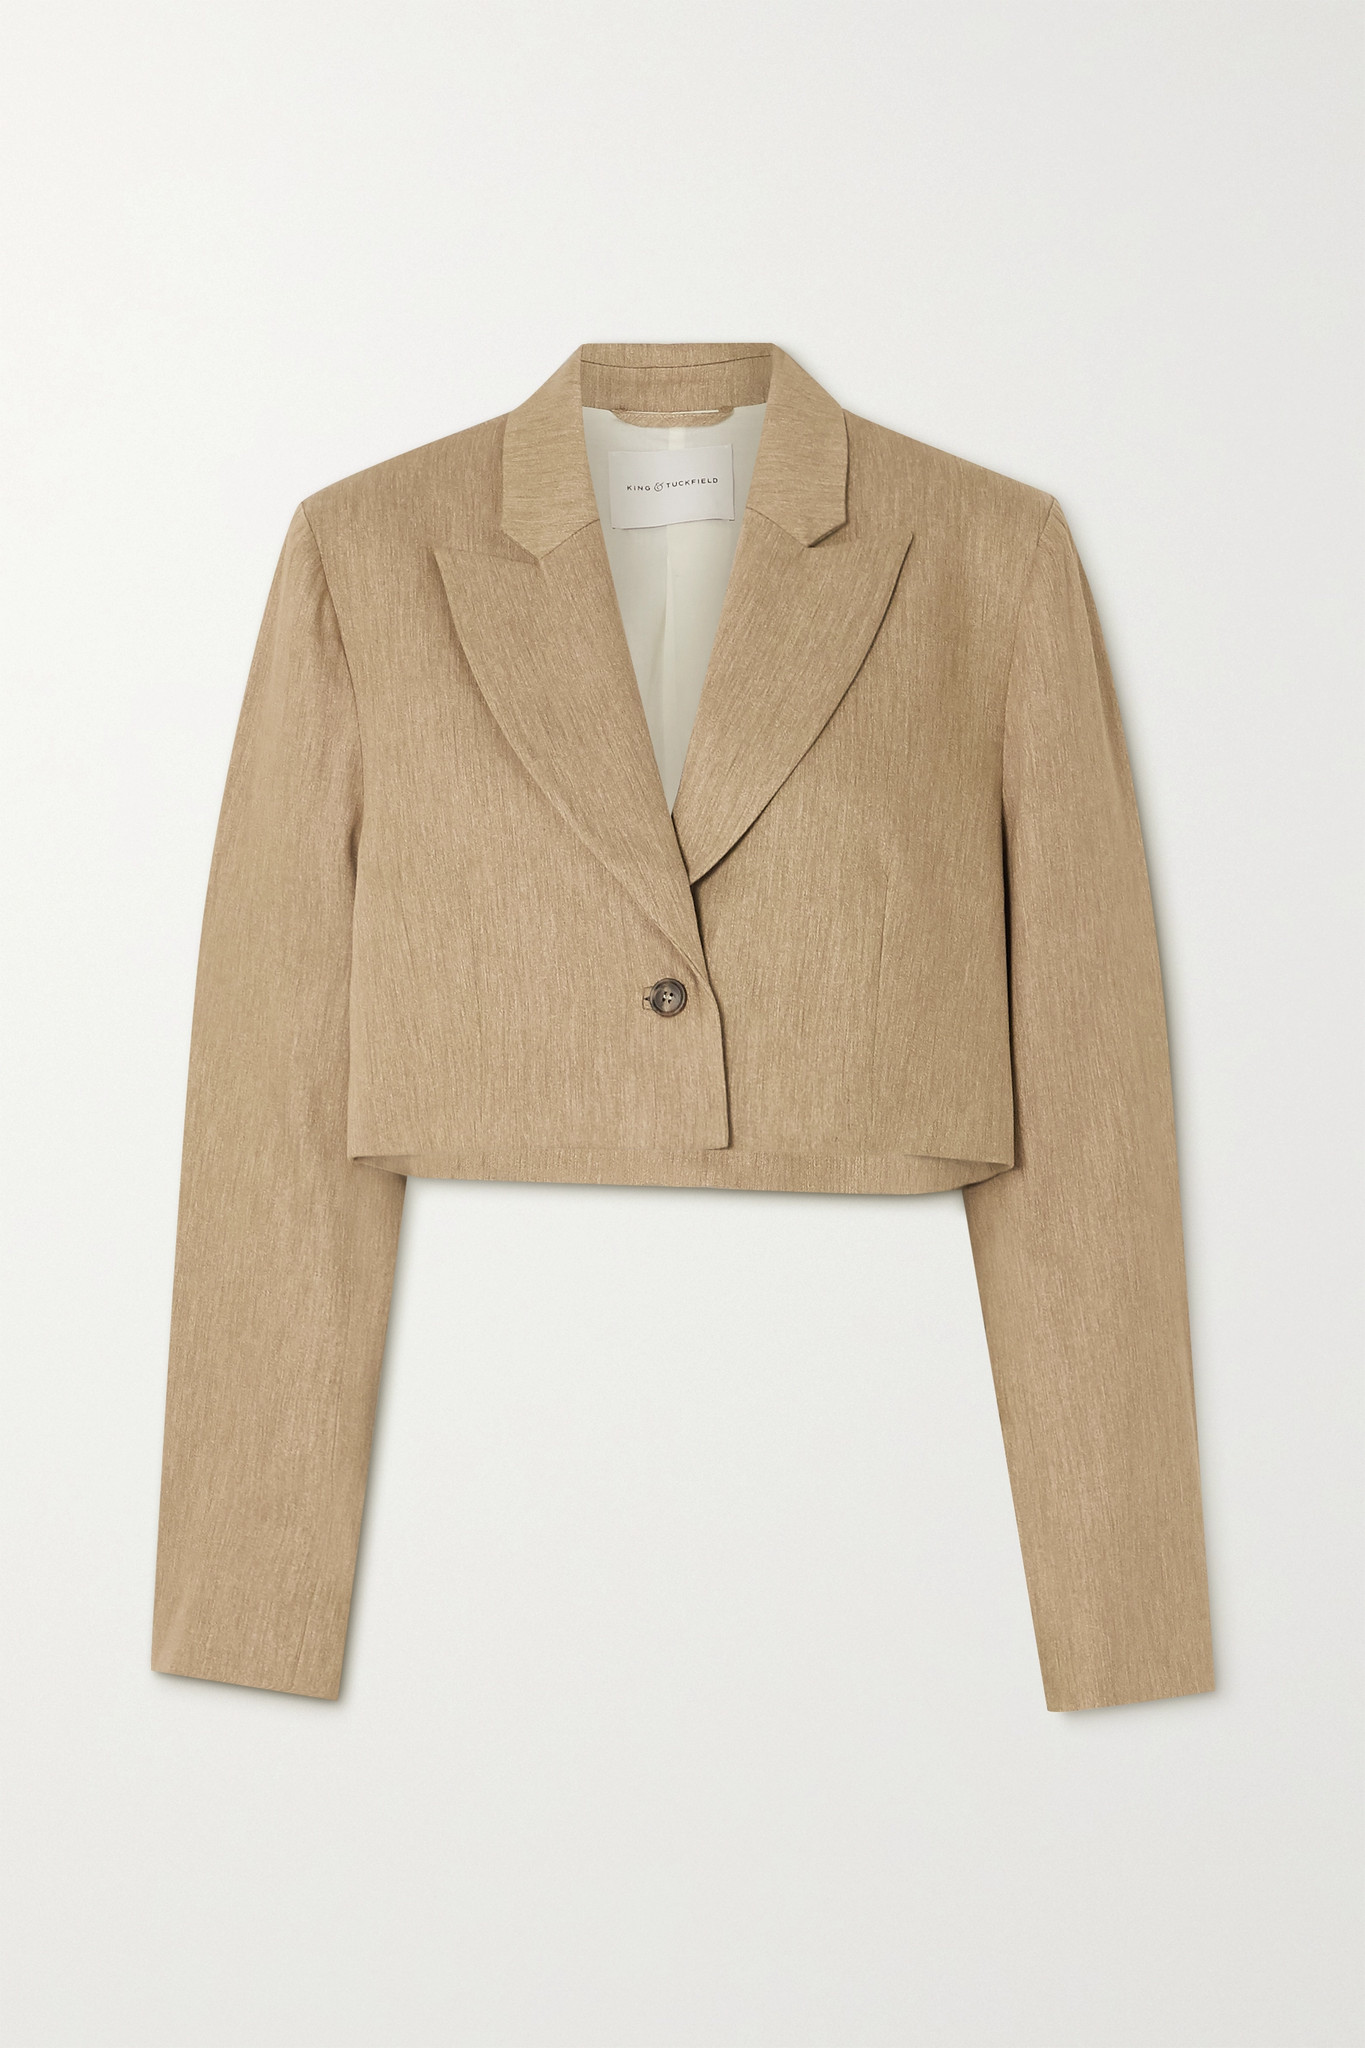 KING & TUCKFIELD - 纯棉短款西装外套 - 中性色 - small